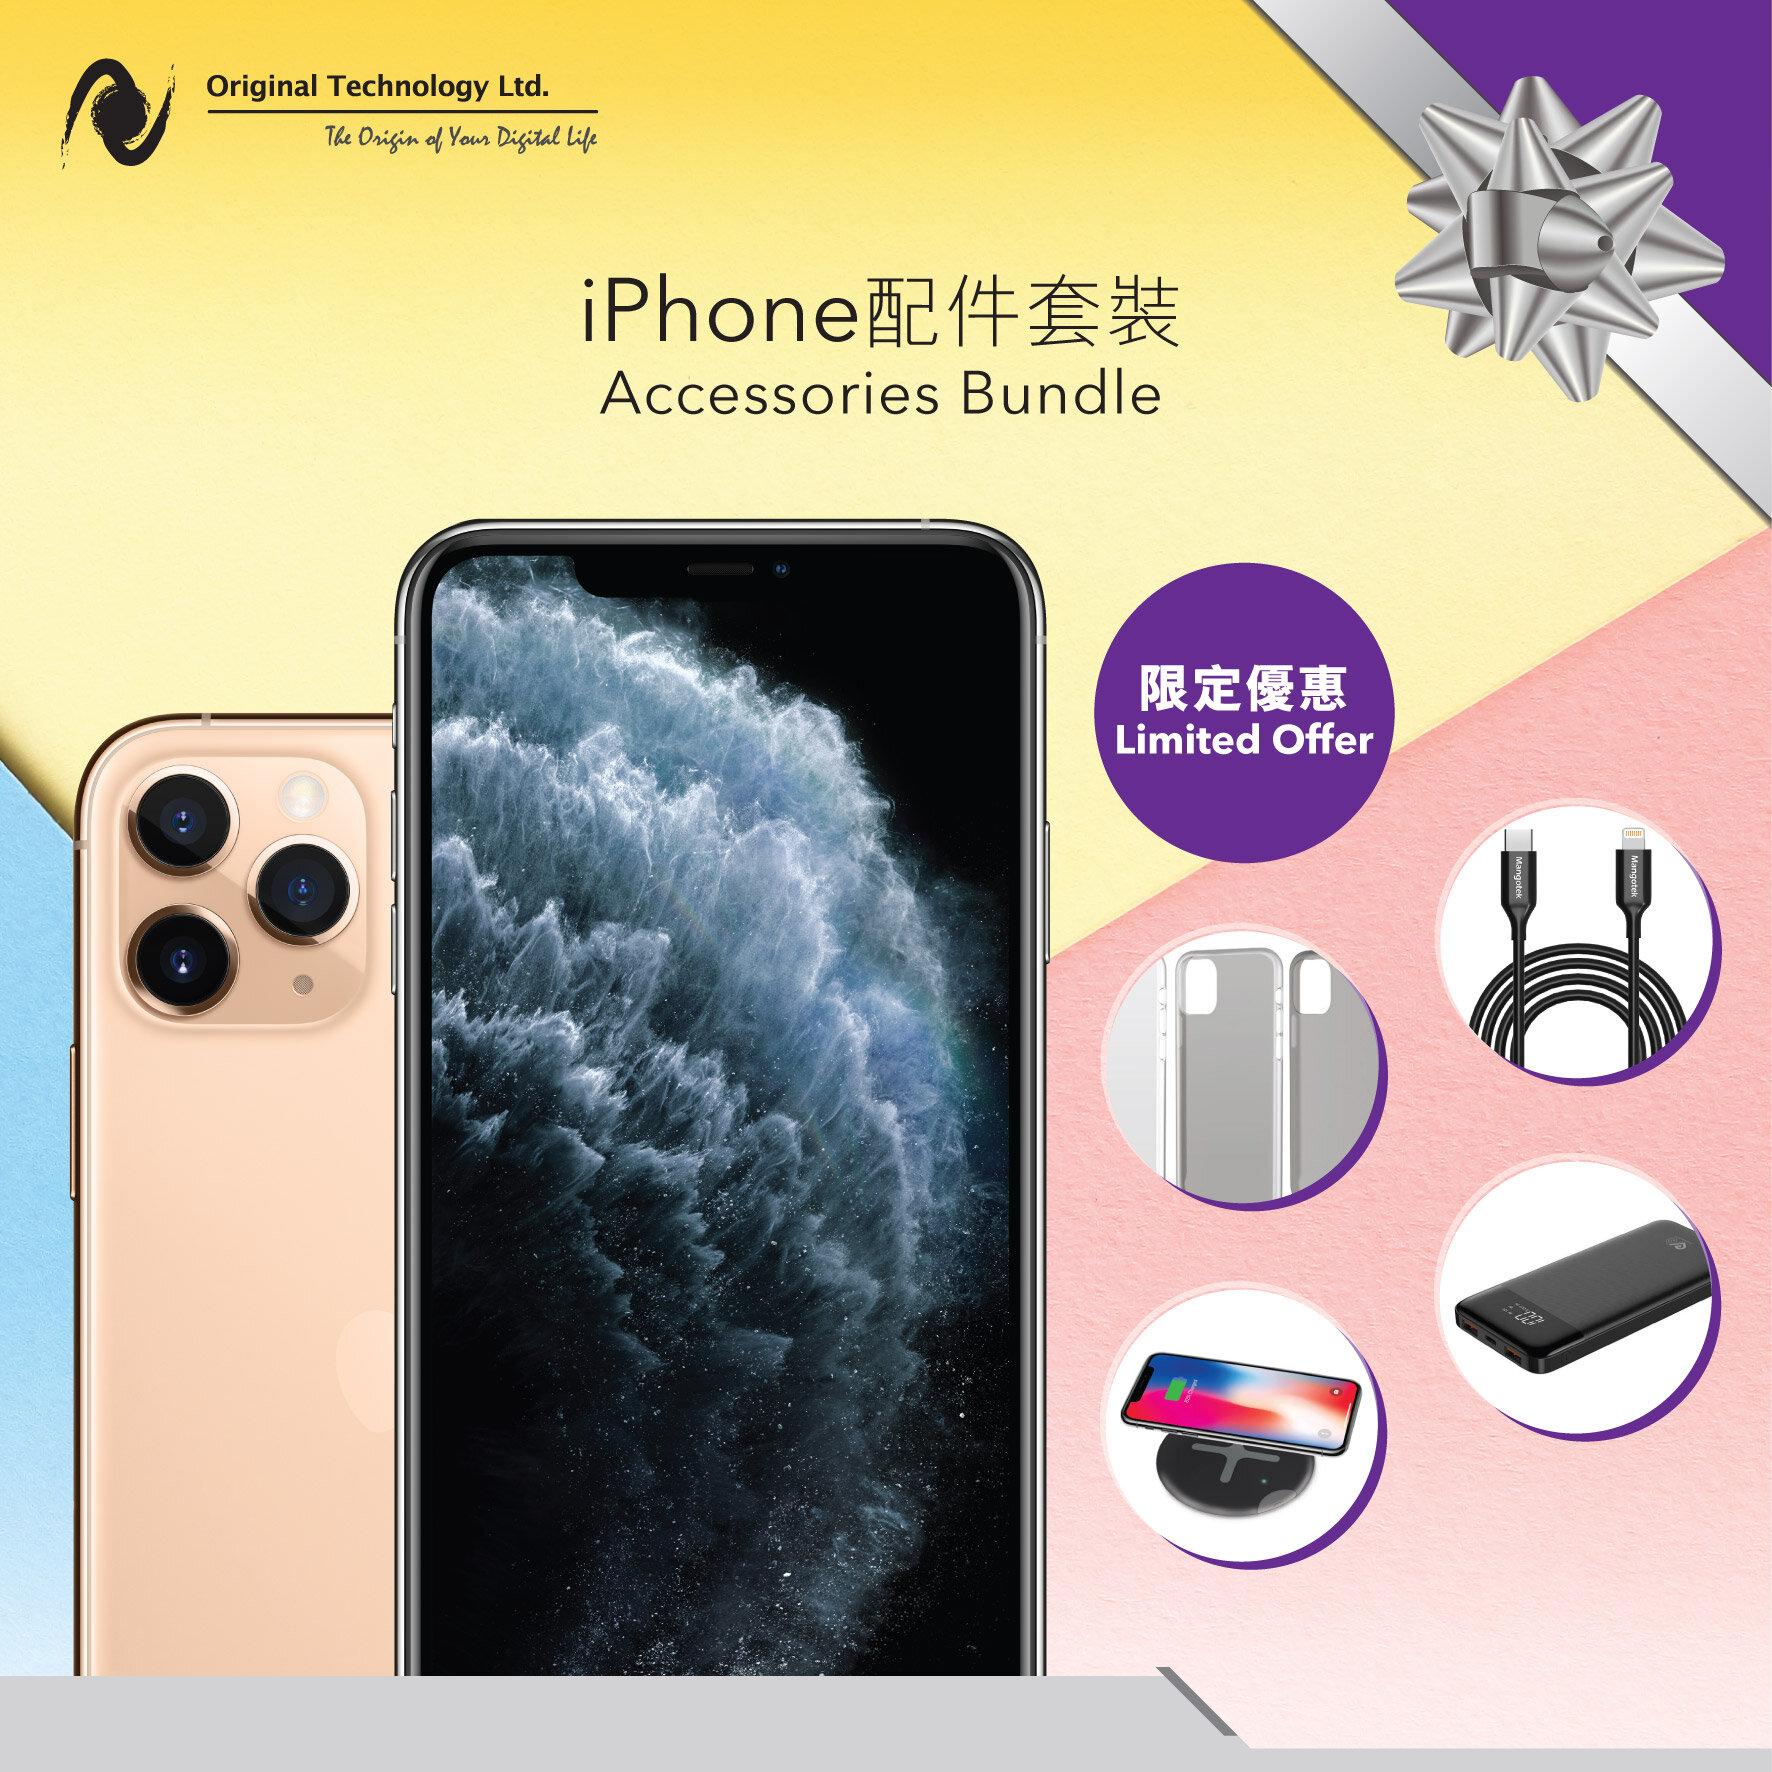 PR02_iPhone Bundle Offer_01-01.jpg